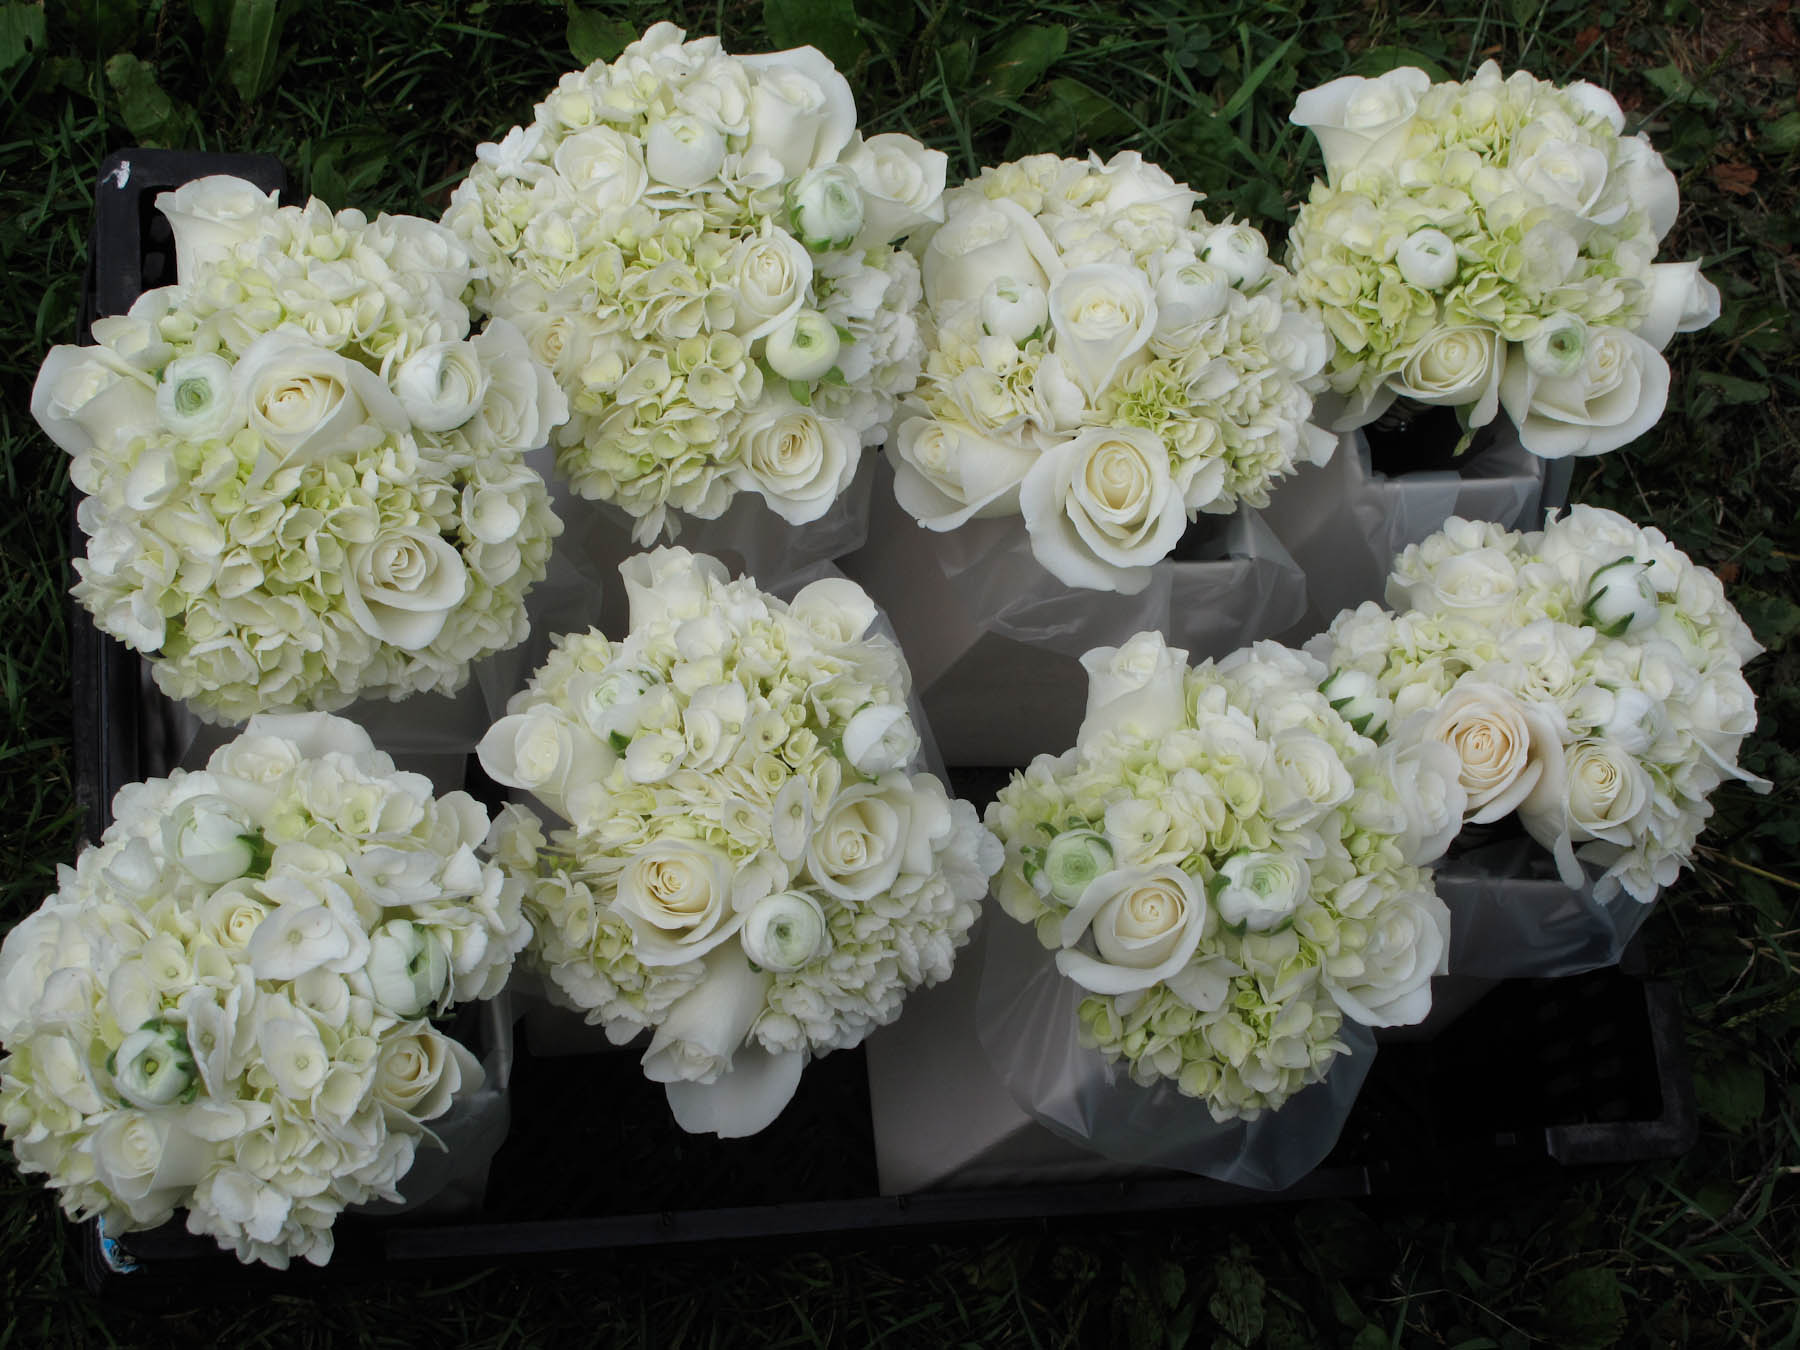 ranunculus wedding bouquet photo - 1